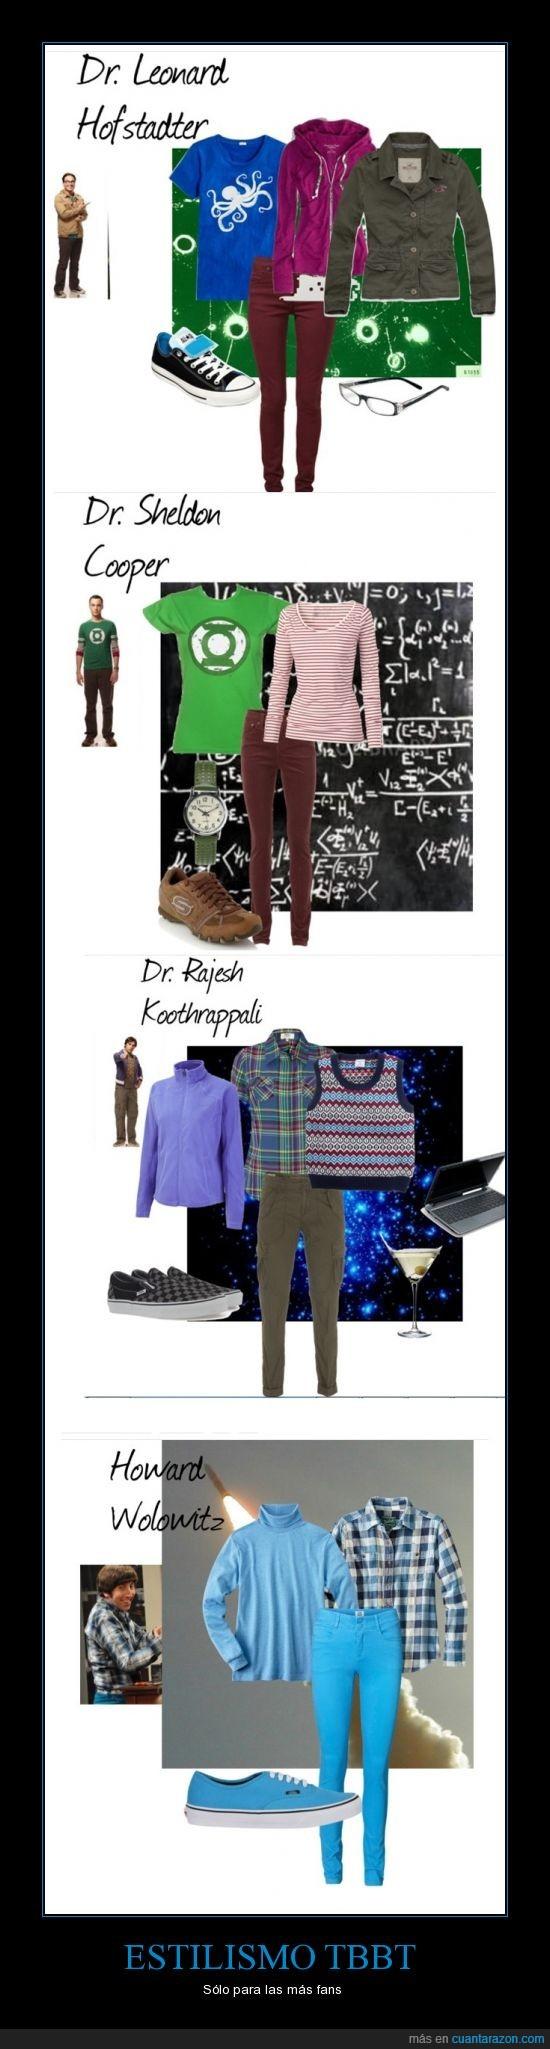 big bang theory,estilismo,leonard,ropa,sheldon,tbbt